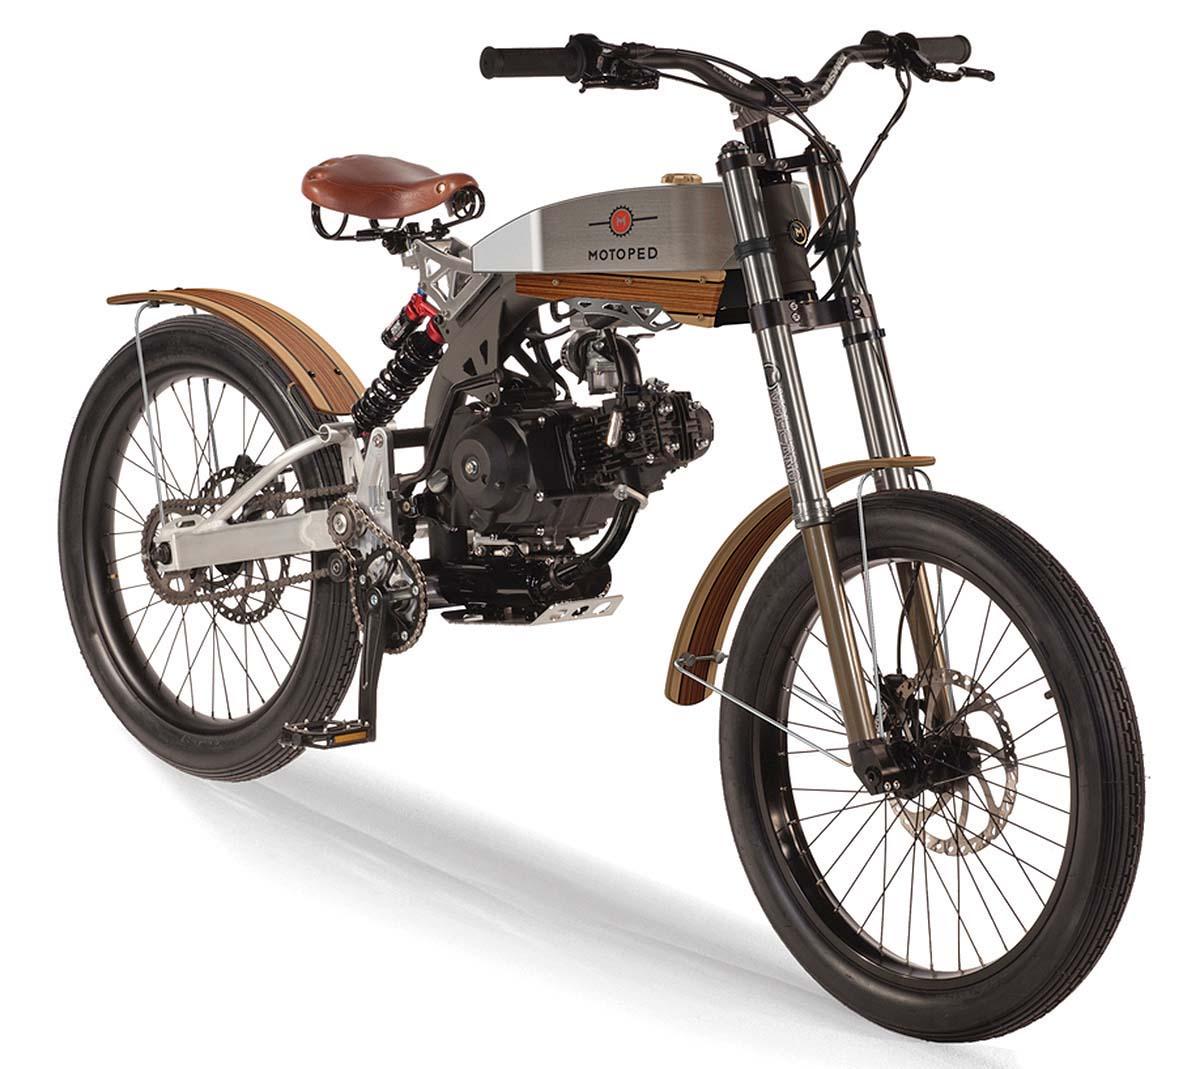 Cool two-wheelers